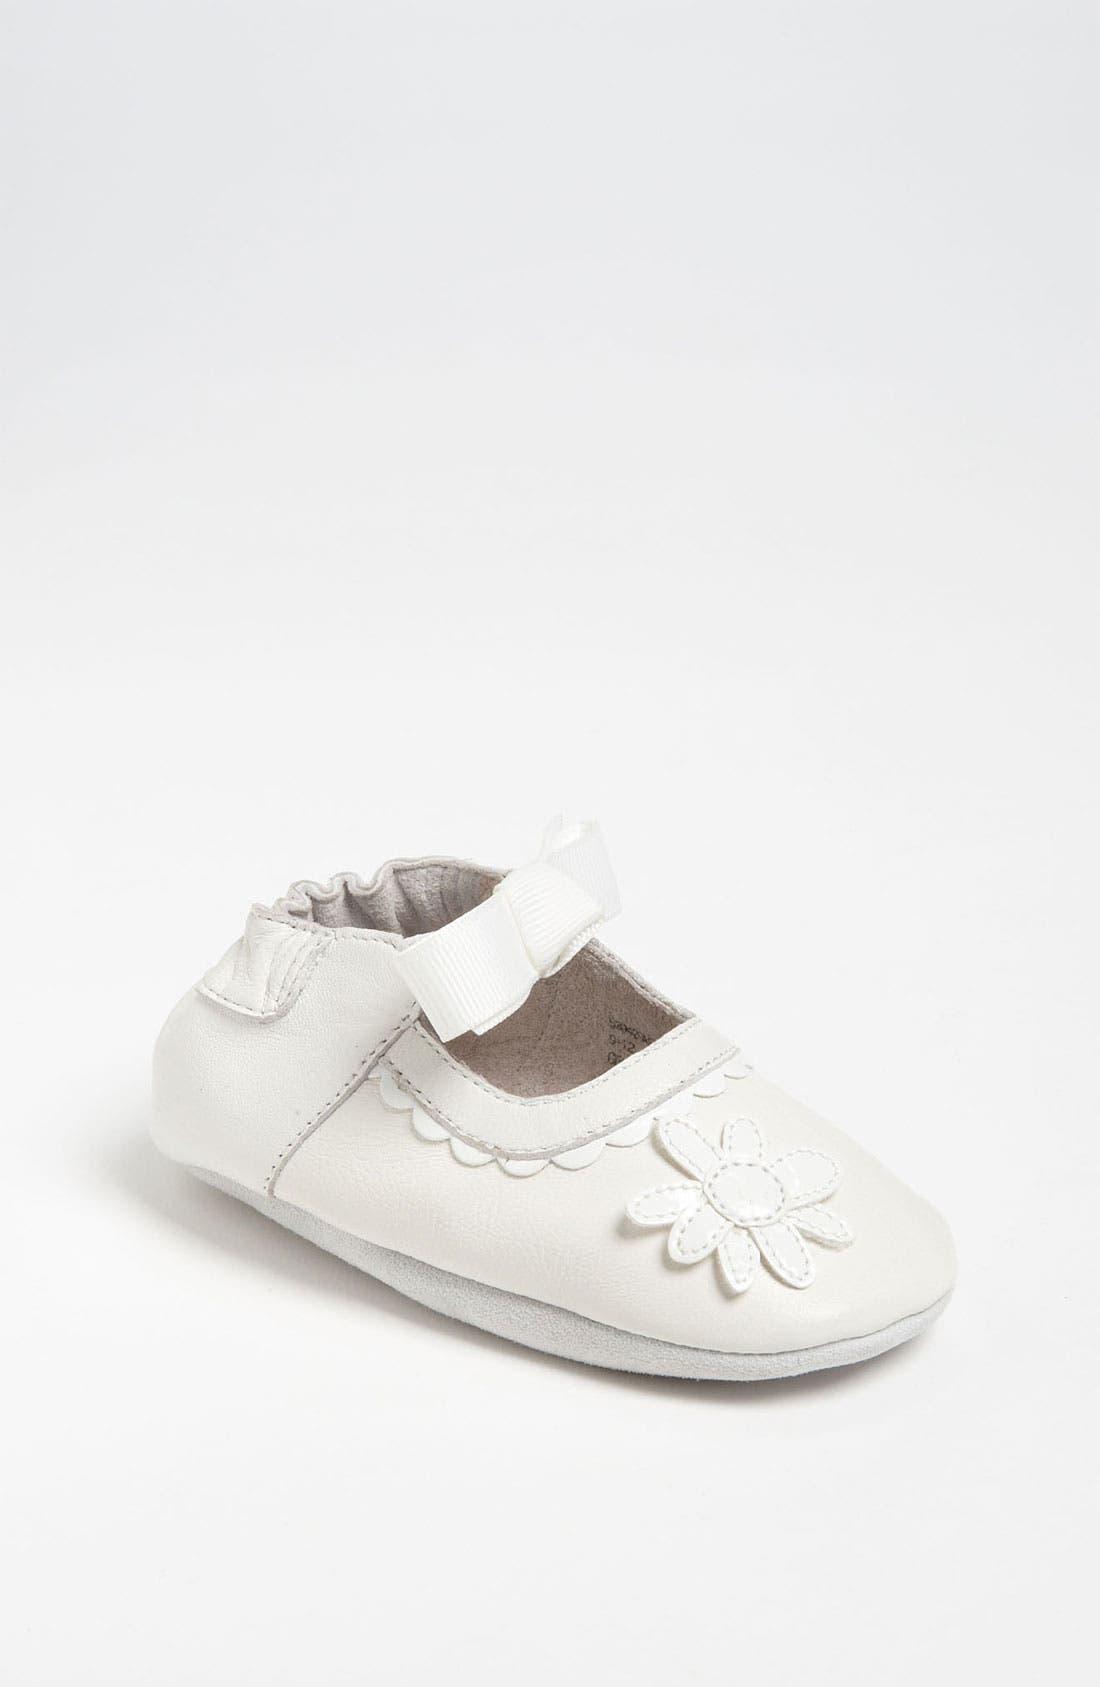 Alternate Image 1 Selected - Nordstrom Baby 'Daisy' Crib Shoe (Infant)